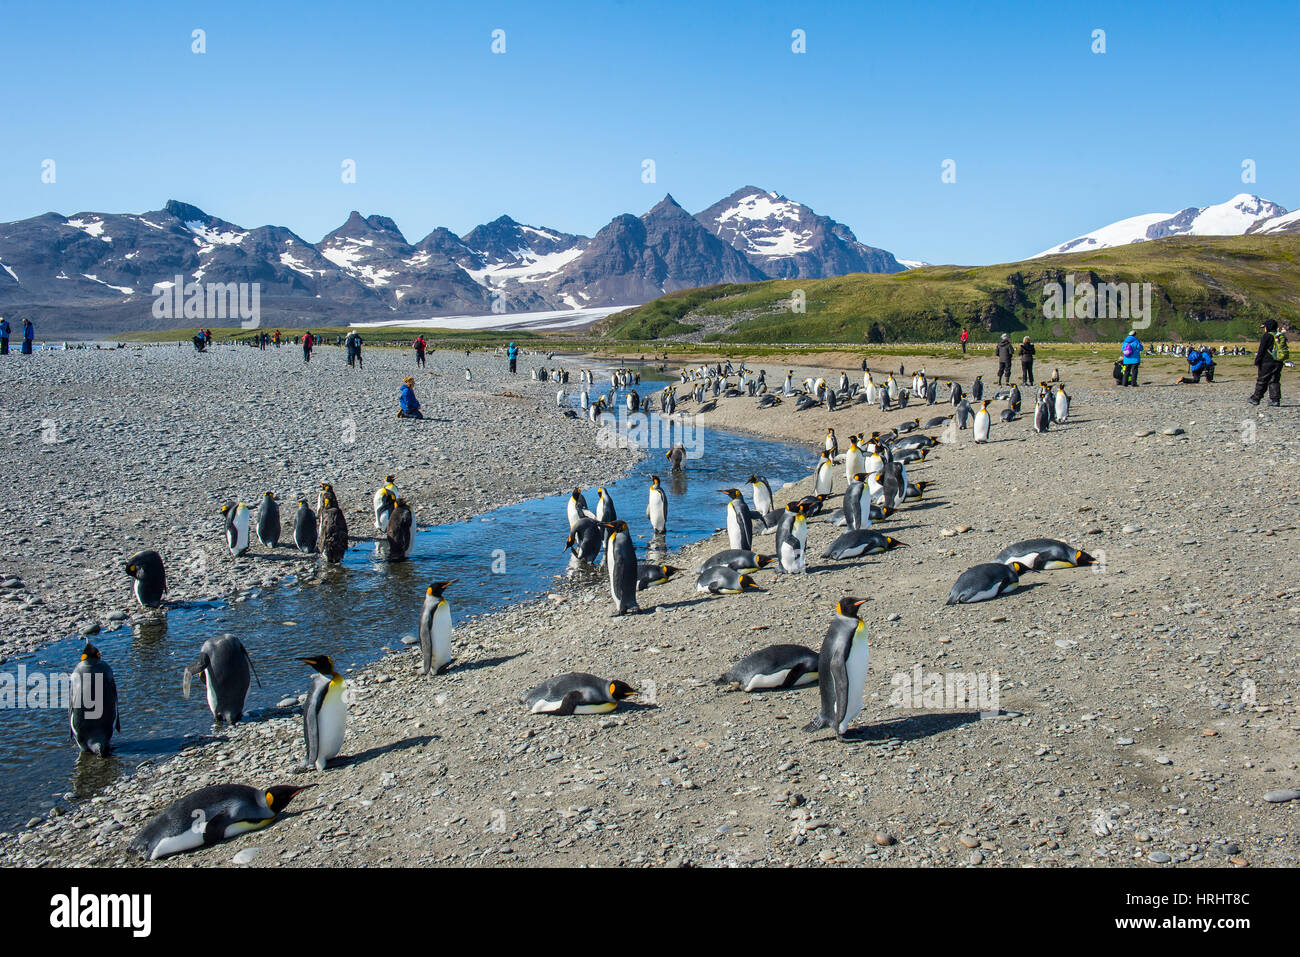 Giant king penguin (Aptenodytes patagonicus) colony, Salisbury Plain, South Georgia, Antarctica, Polar Regions - Stock Image